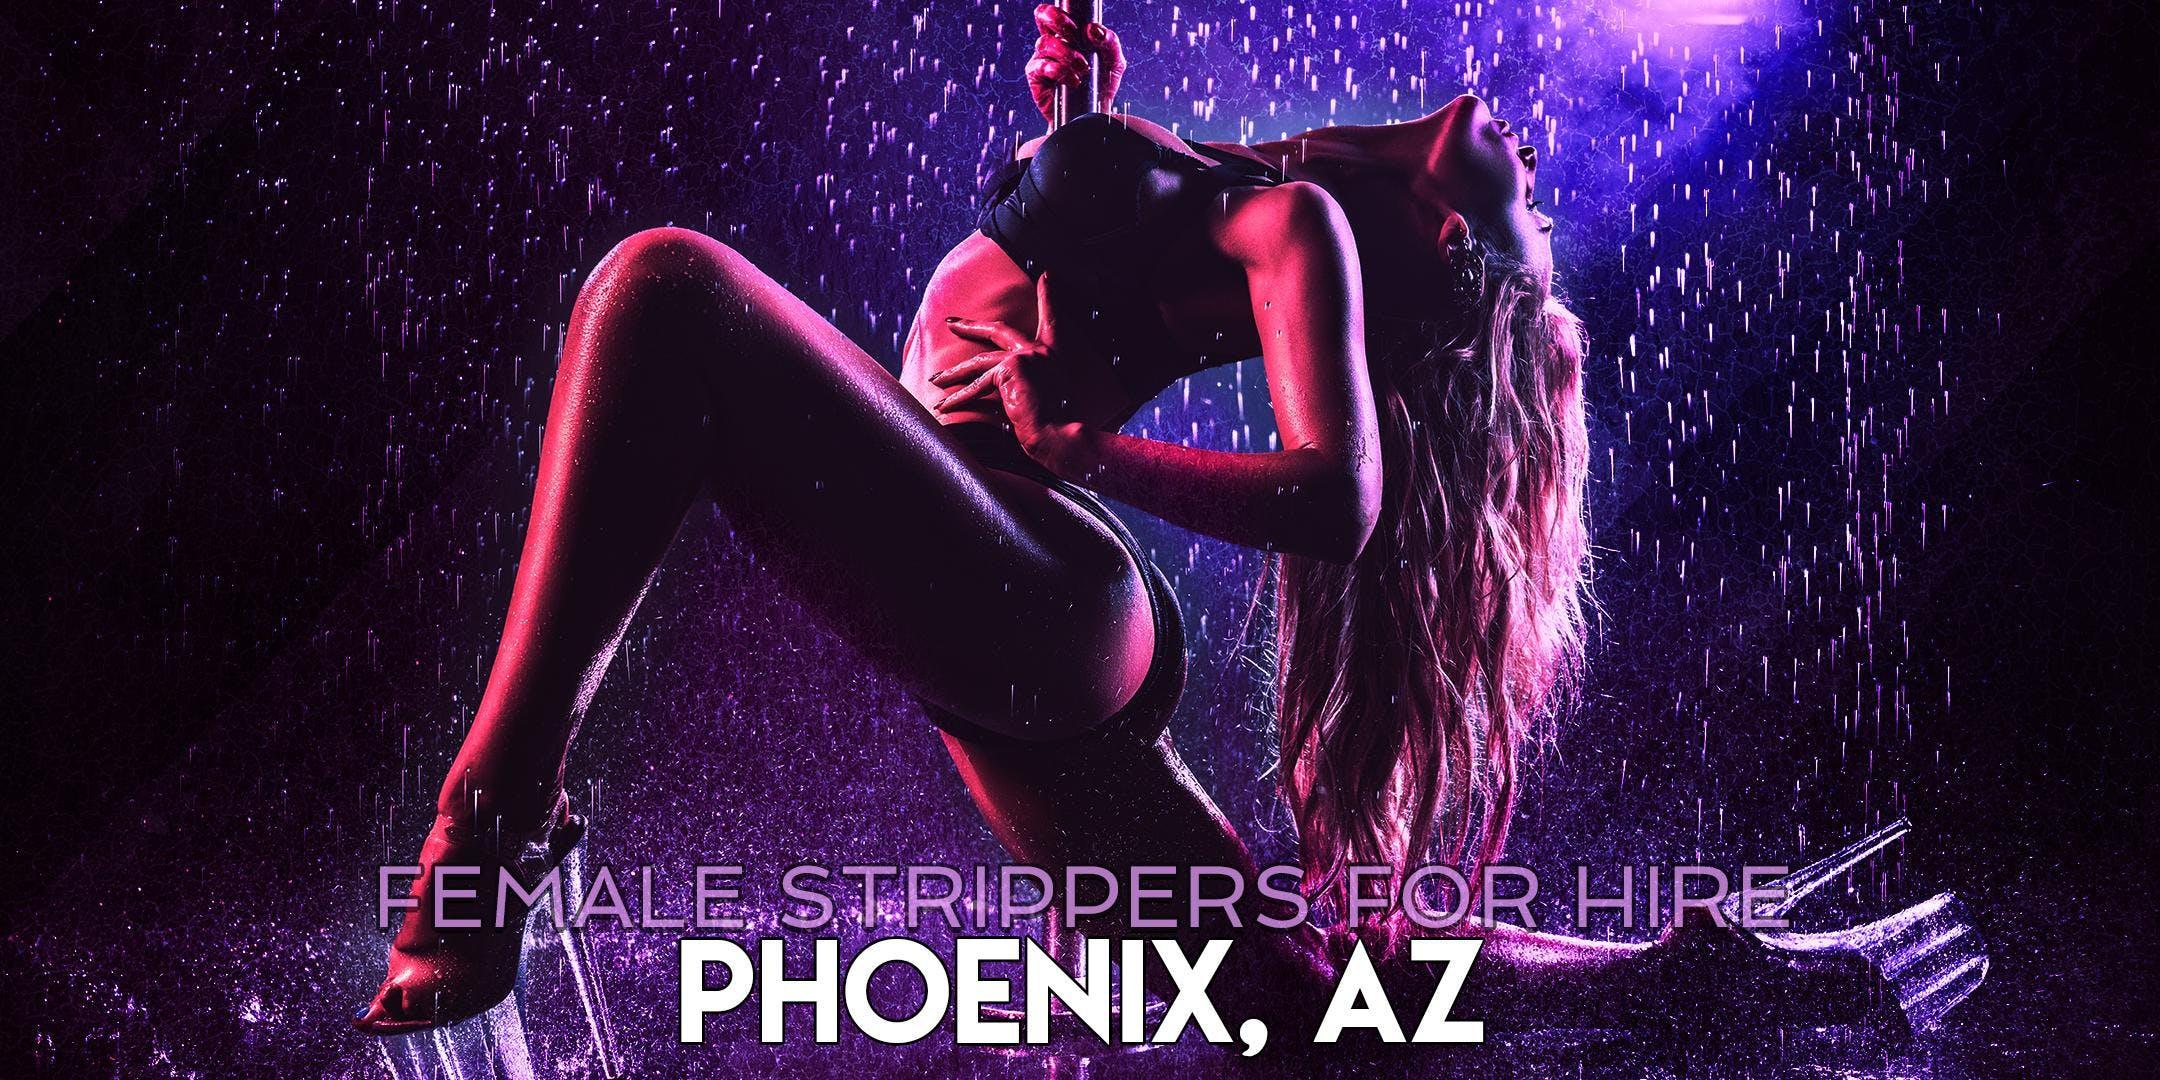 Hire a Female Stripper Phoenix AZ - Priavte Party female Strippers for Hire Phoenix